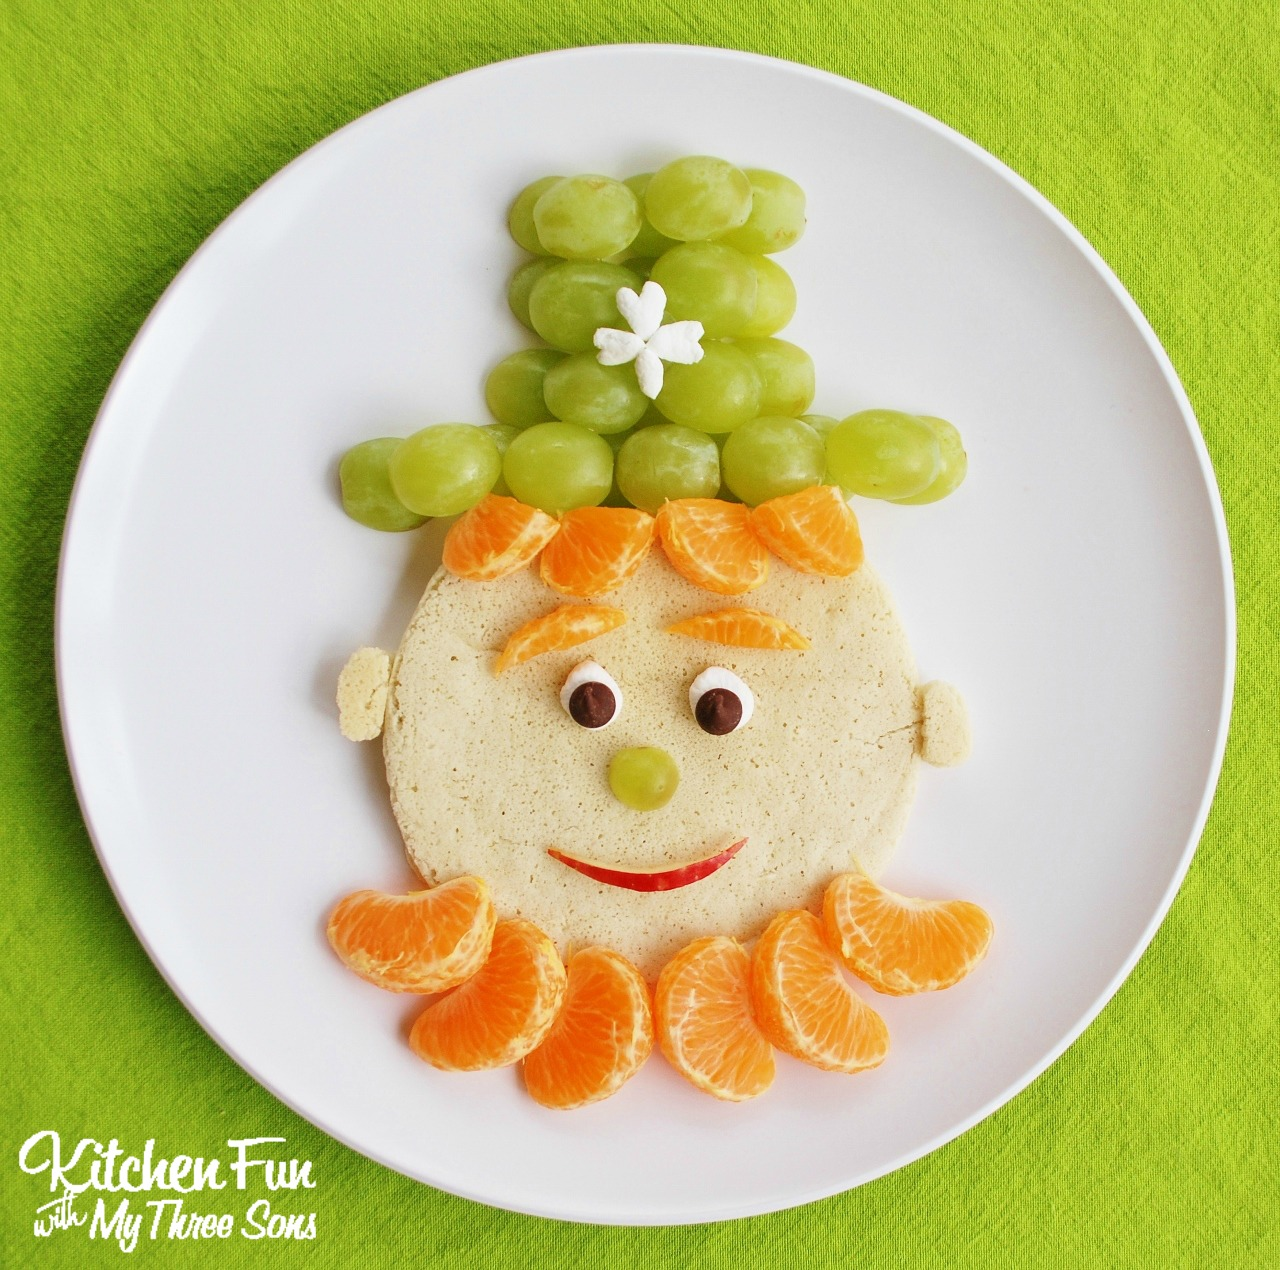 St Patrick S Day Breakfast She Brooke: Kitchen Fun With My 3 Sons: St. Patrick's Day Leprechaun